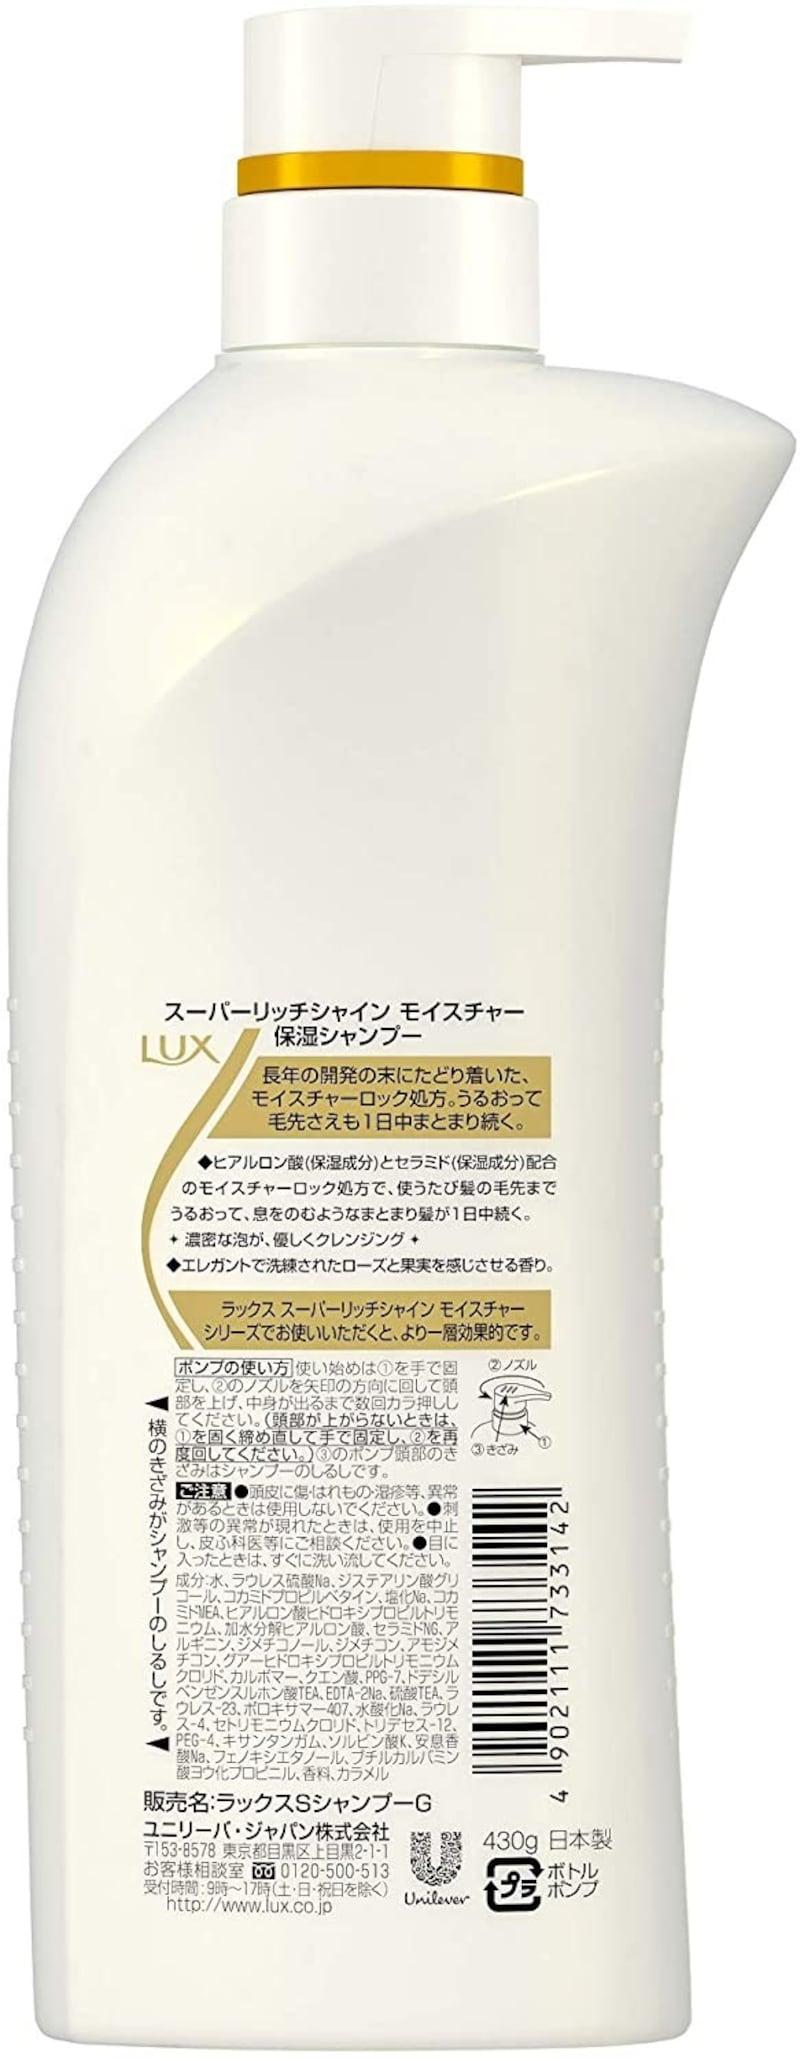 LUX(ラックス),モイスチャー 保湿シャンプー